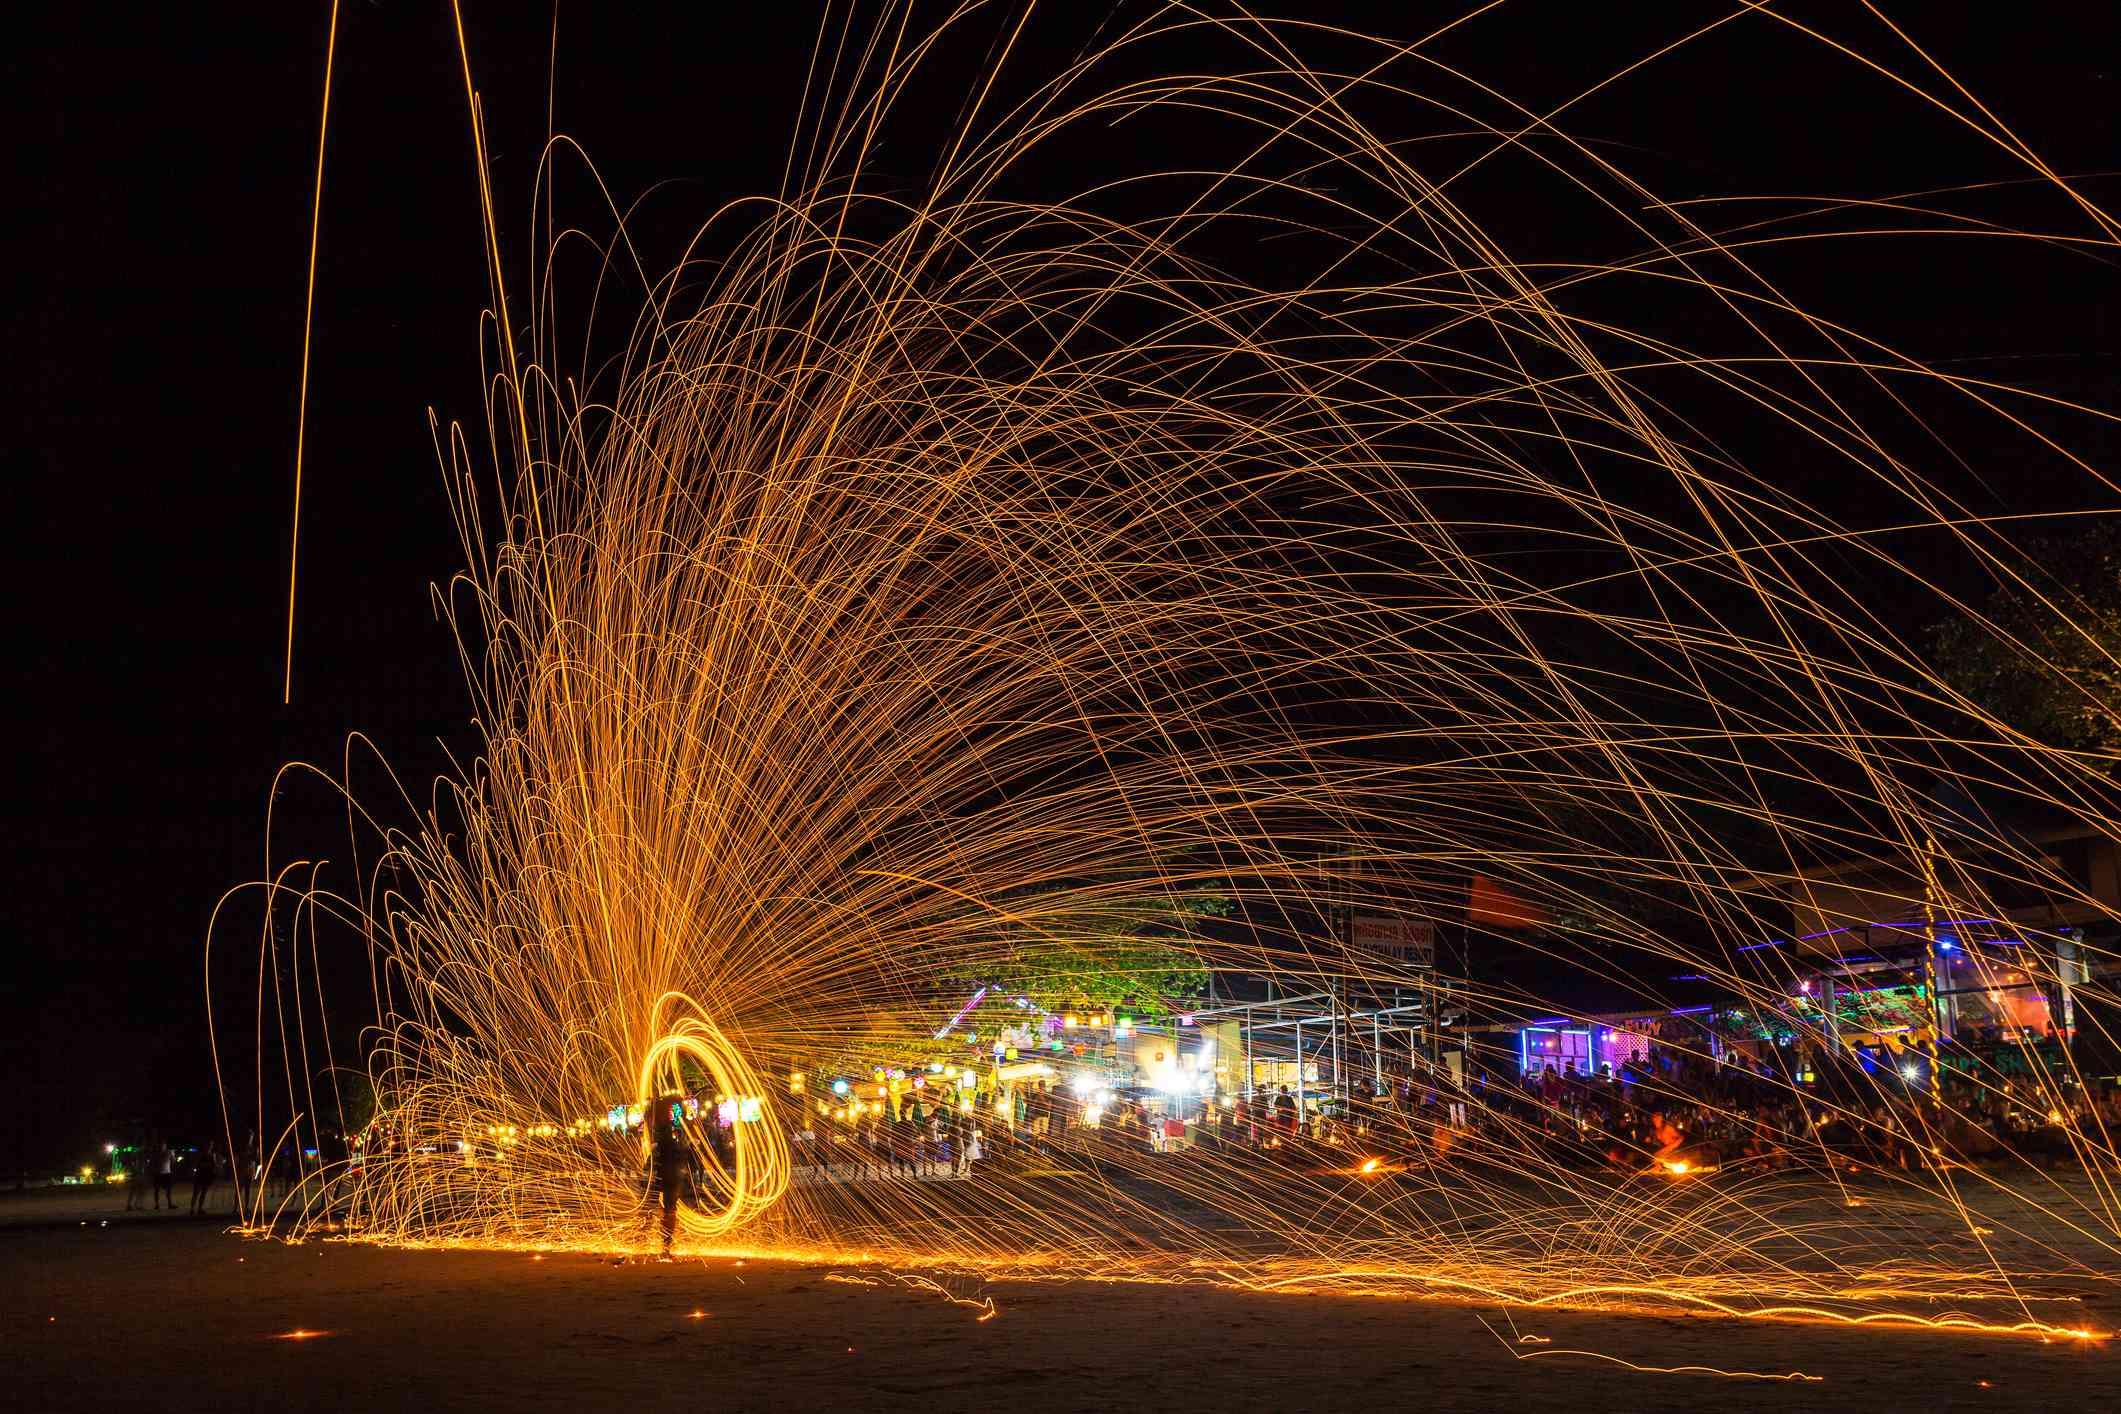 Fireworks on Phuket beach, Thailand